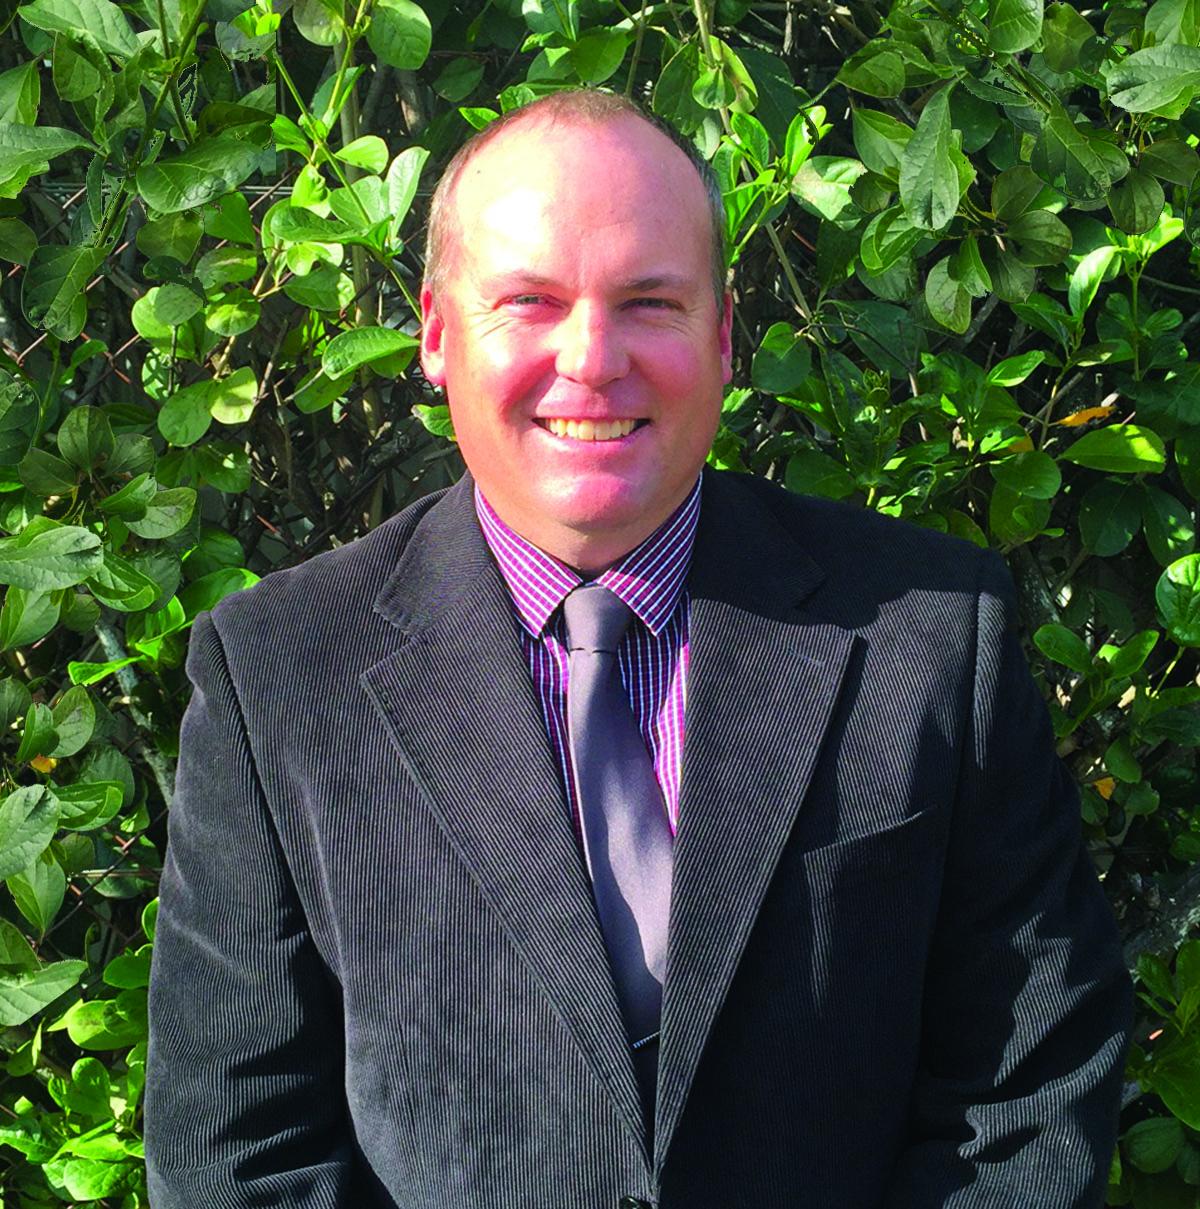 Cr Robbie Radel